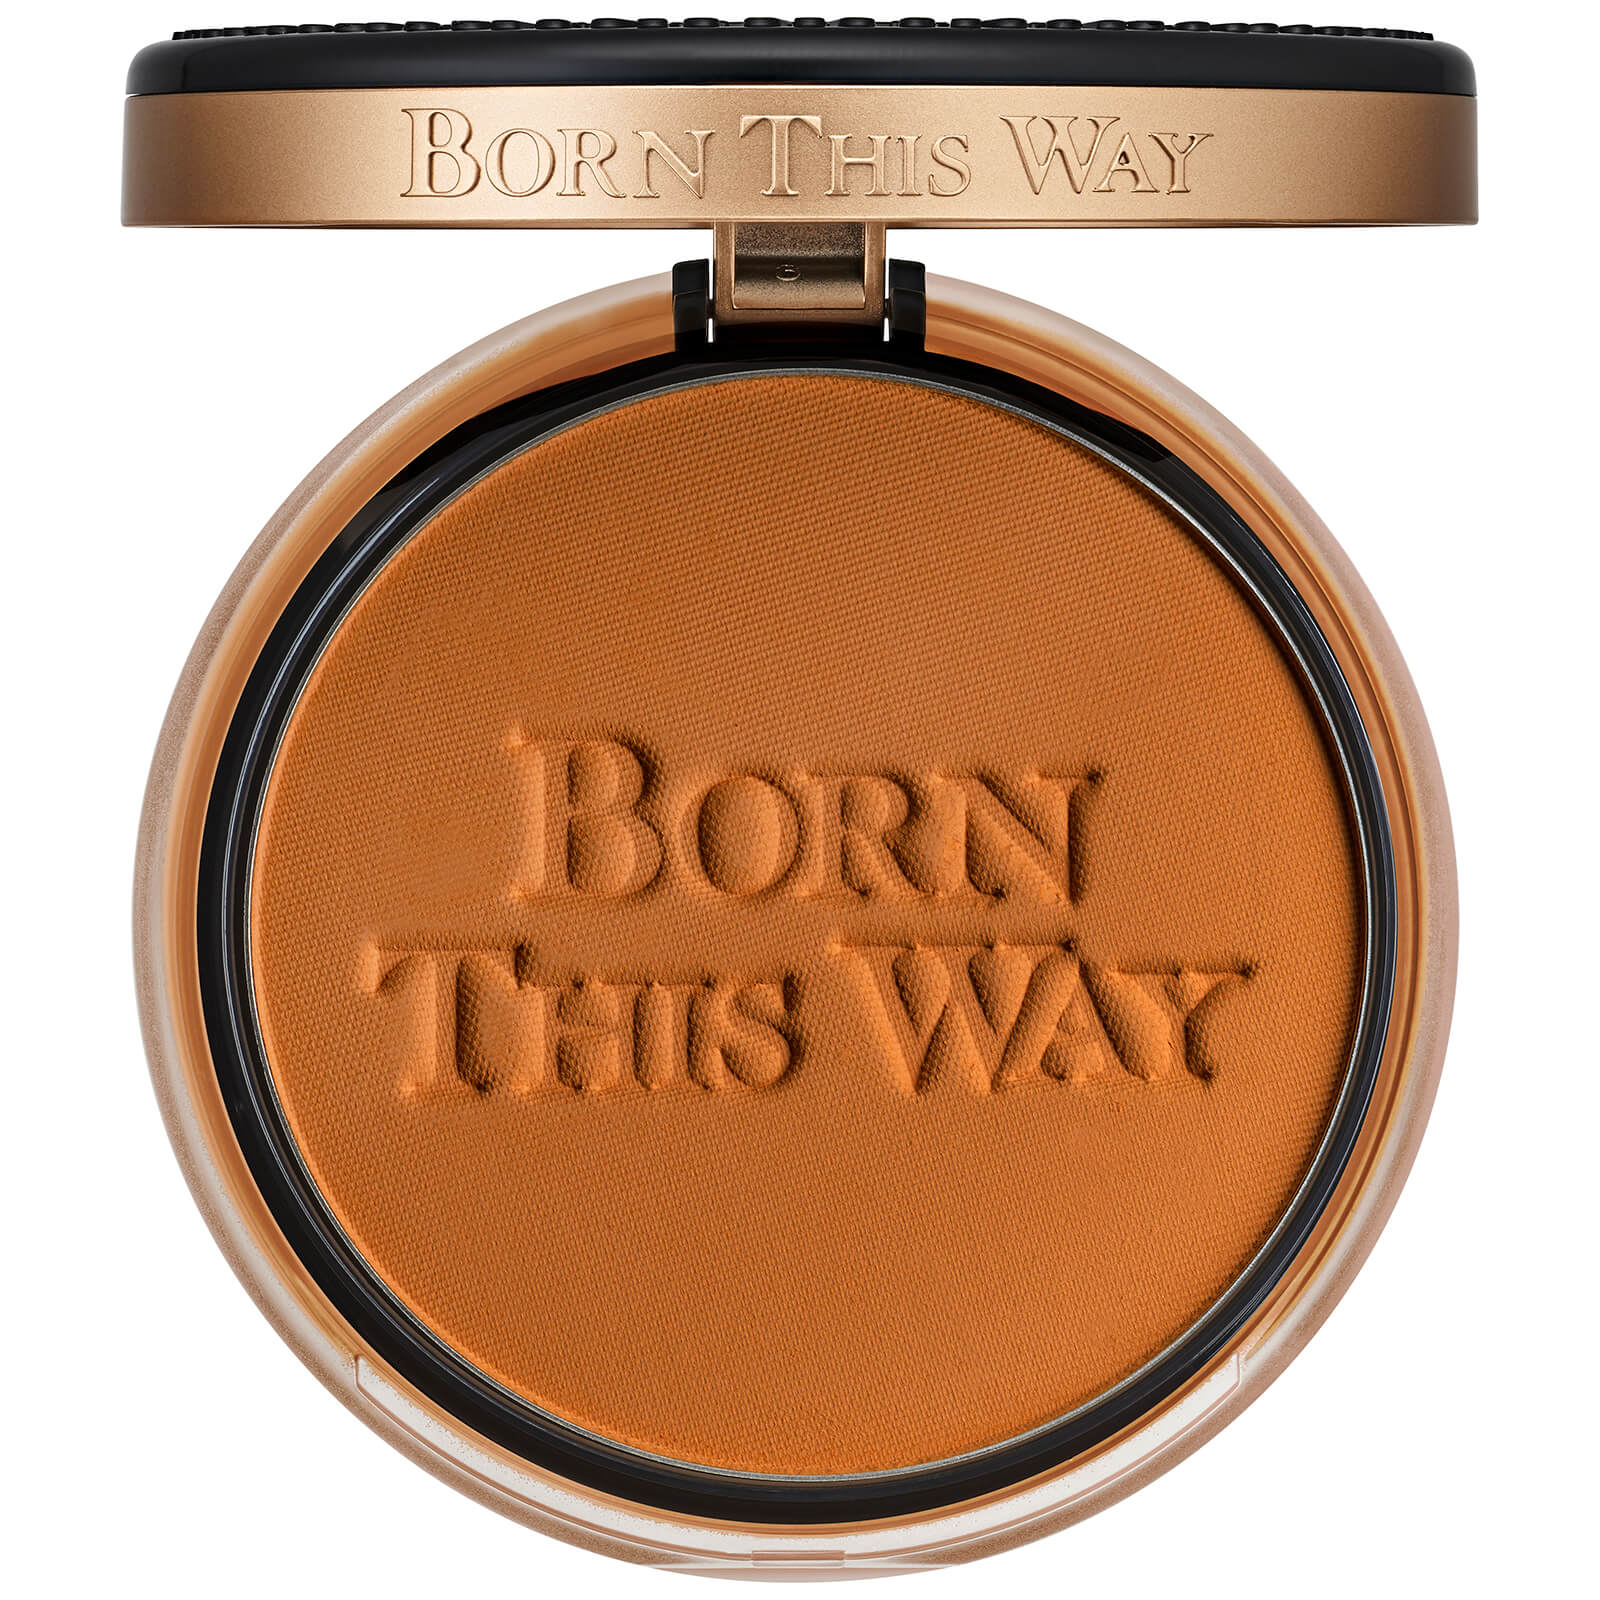 Too Faced Born This Way Multi-Use Complexion Powder (Various Shades) - Mahogany